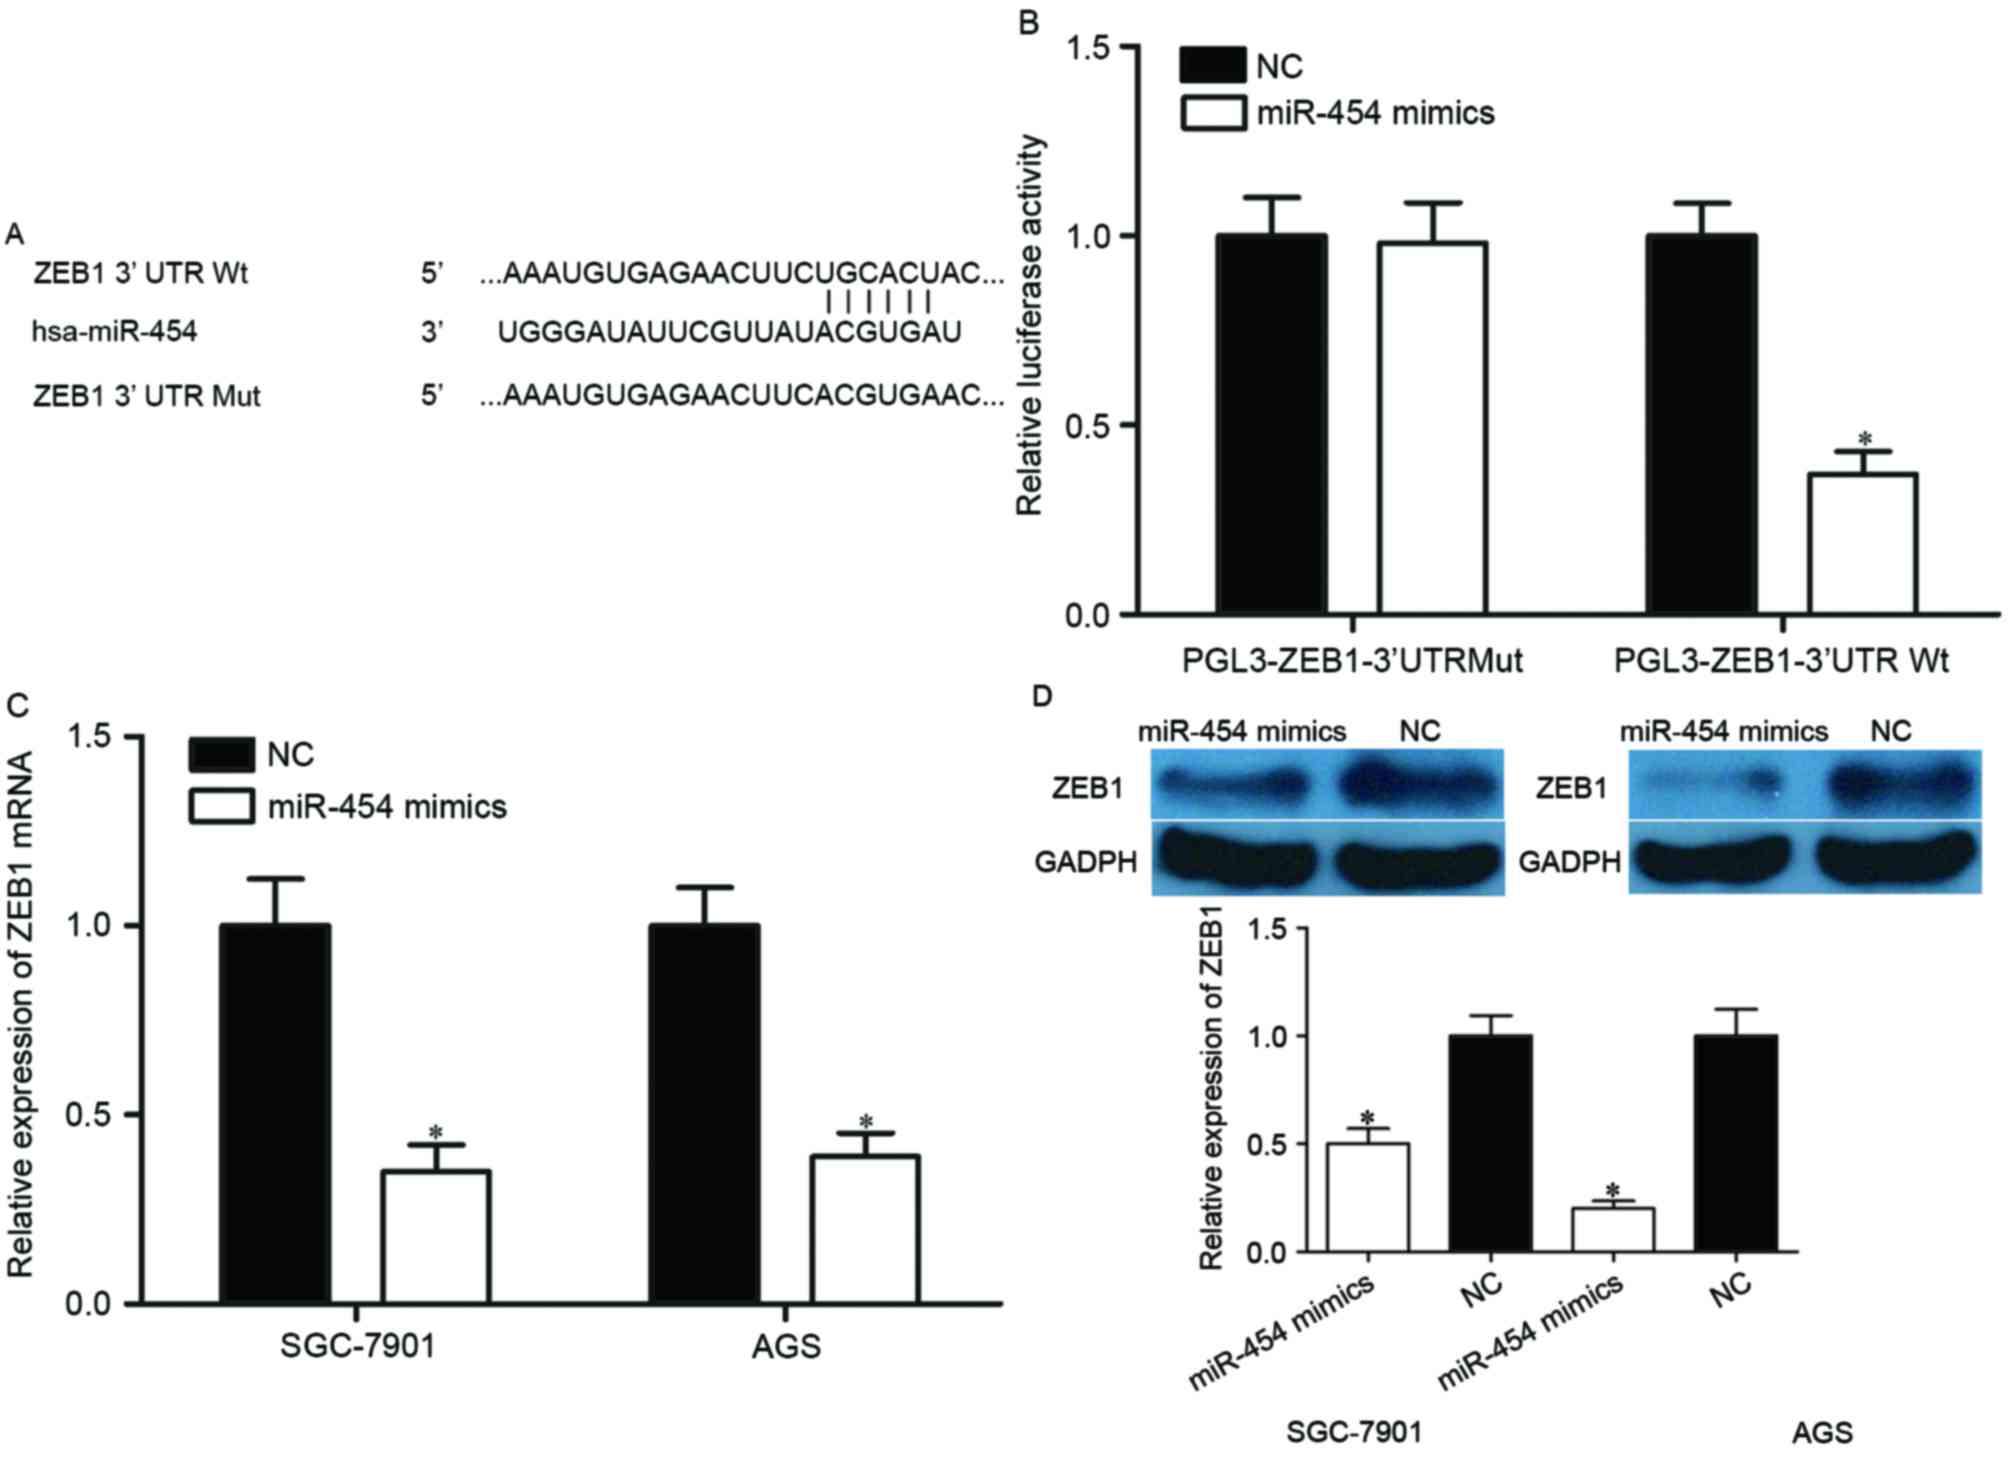 Ags Logistics Pvt Ltd microrna-454 inhibits tumor cell proliferation, migration